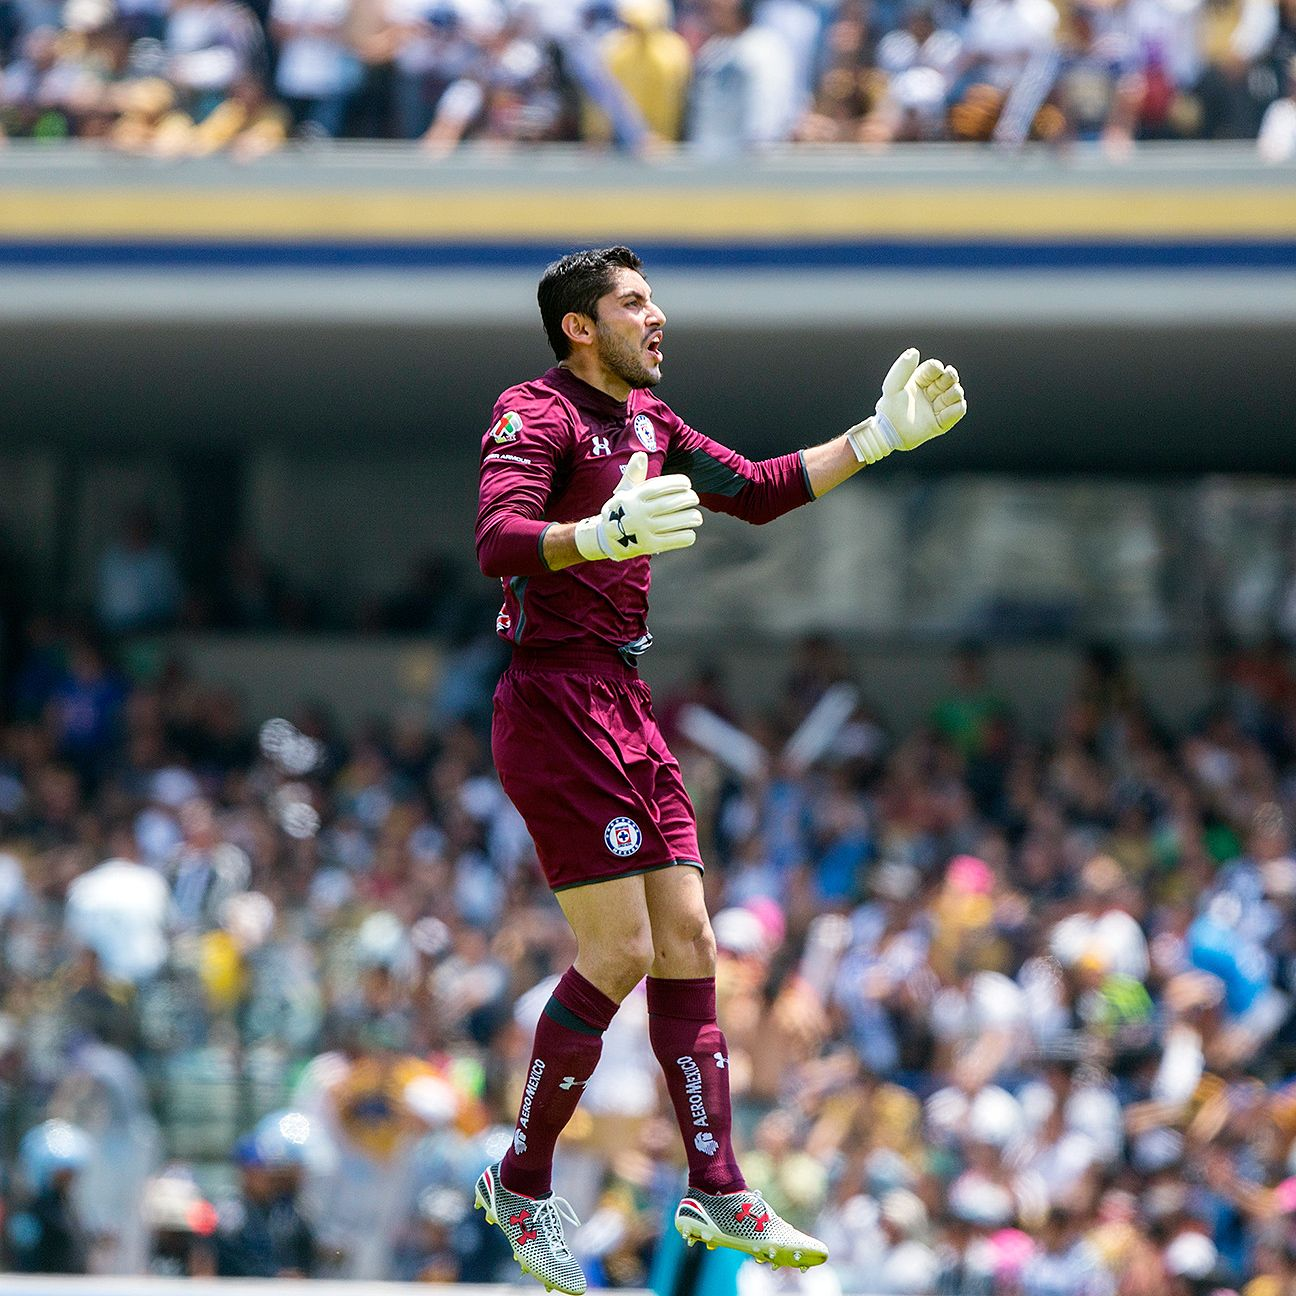 Jesus Corona and Cruz Azul picked up a big momentum-building win at Pumas on Sunday.